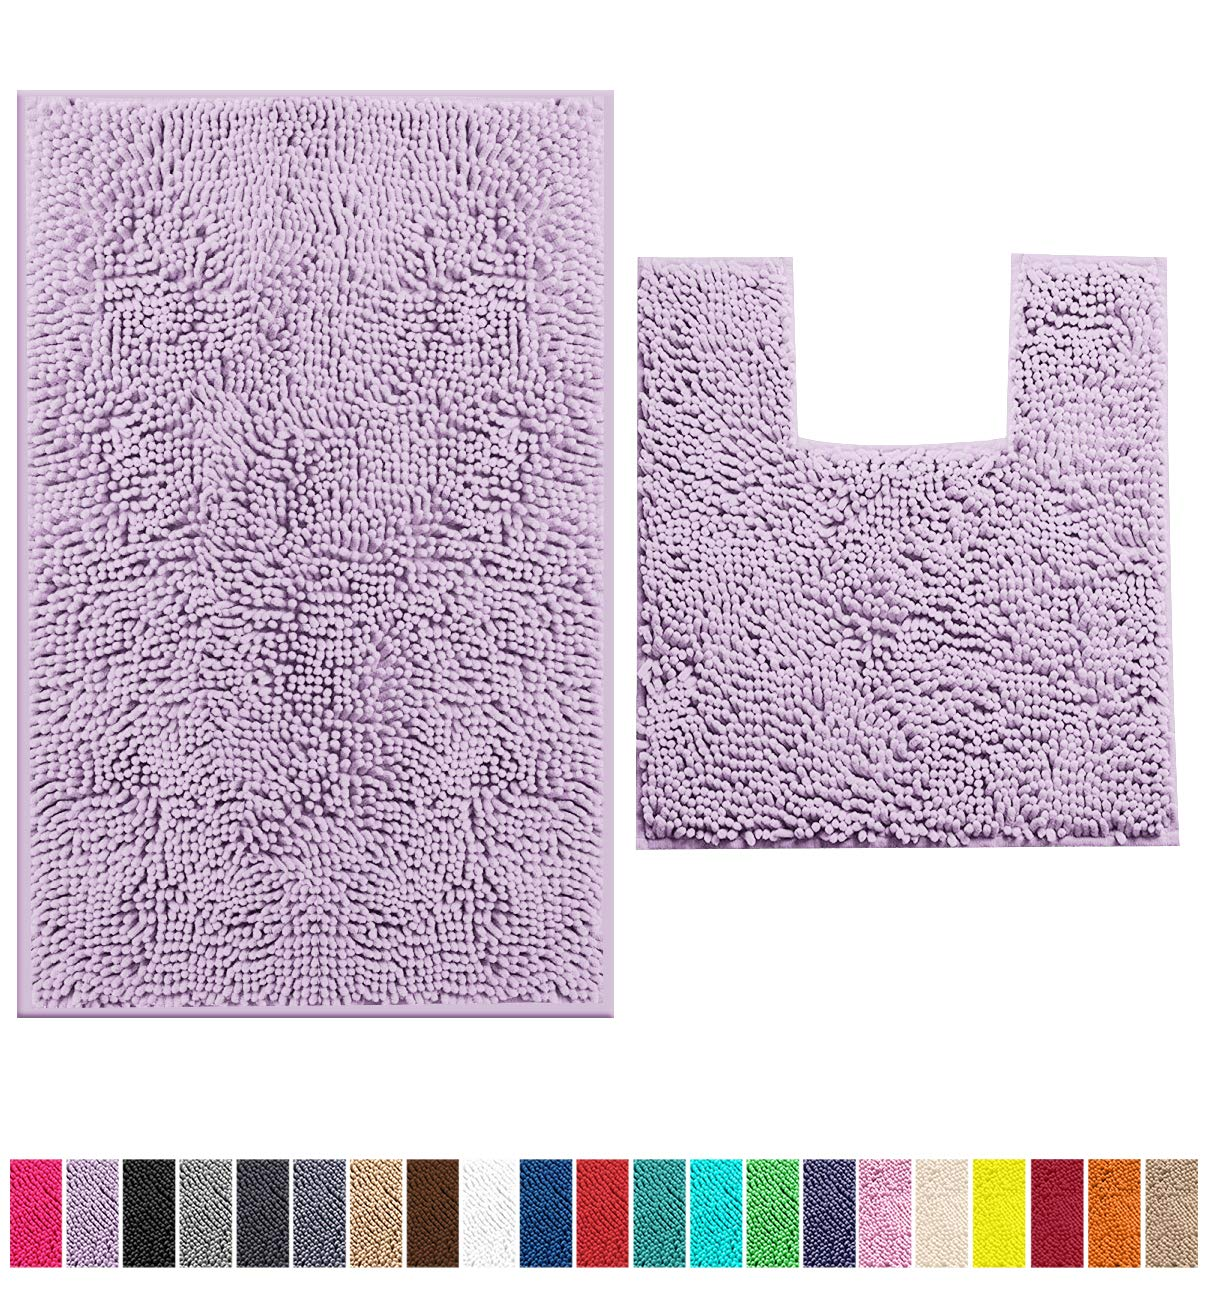 LuxUrux Bathroom Rugs Chenille 2-Piece Bath Mat Set, Soft Plush Anti-Slip Bath Rug +Toilet Mat.1'' Microfiber Shaggy Carpet, Super Absorbent Machine Washable Bath Mats (Curved Set Medium, Lavender)